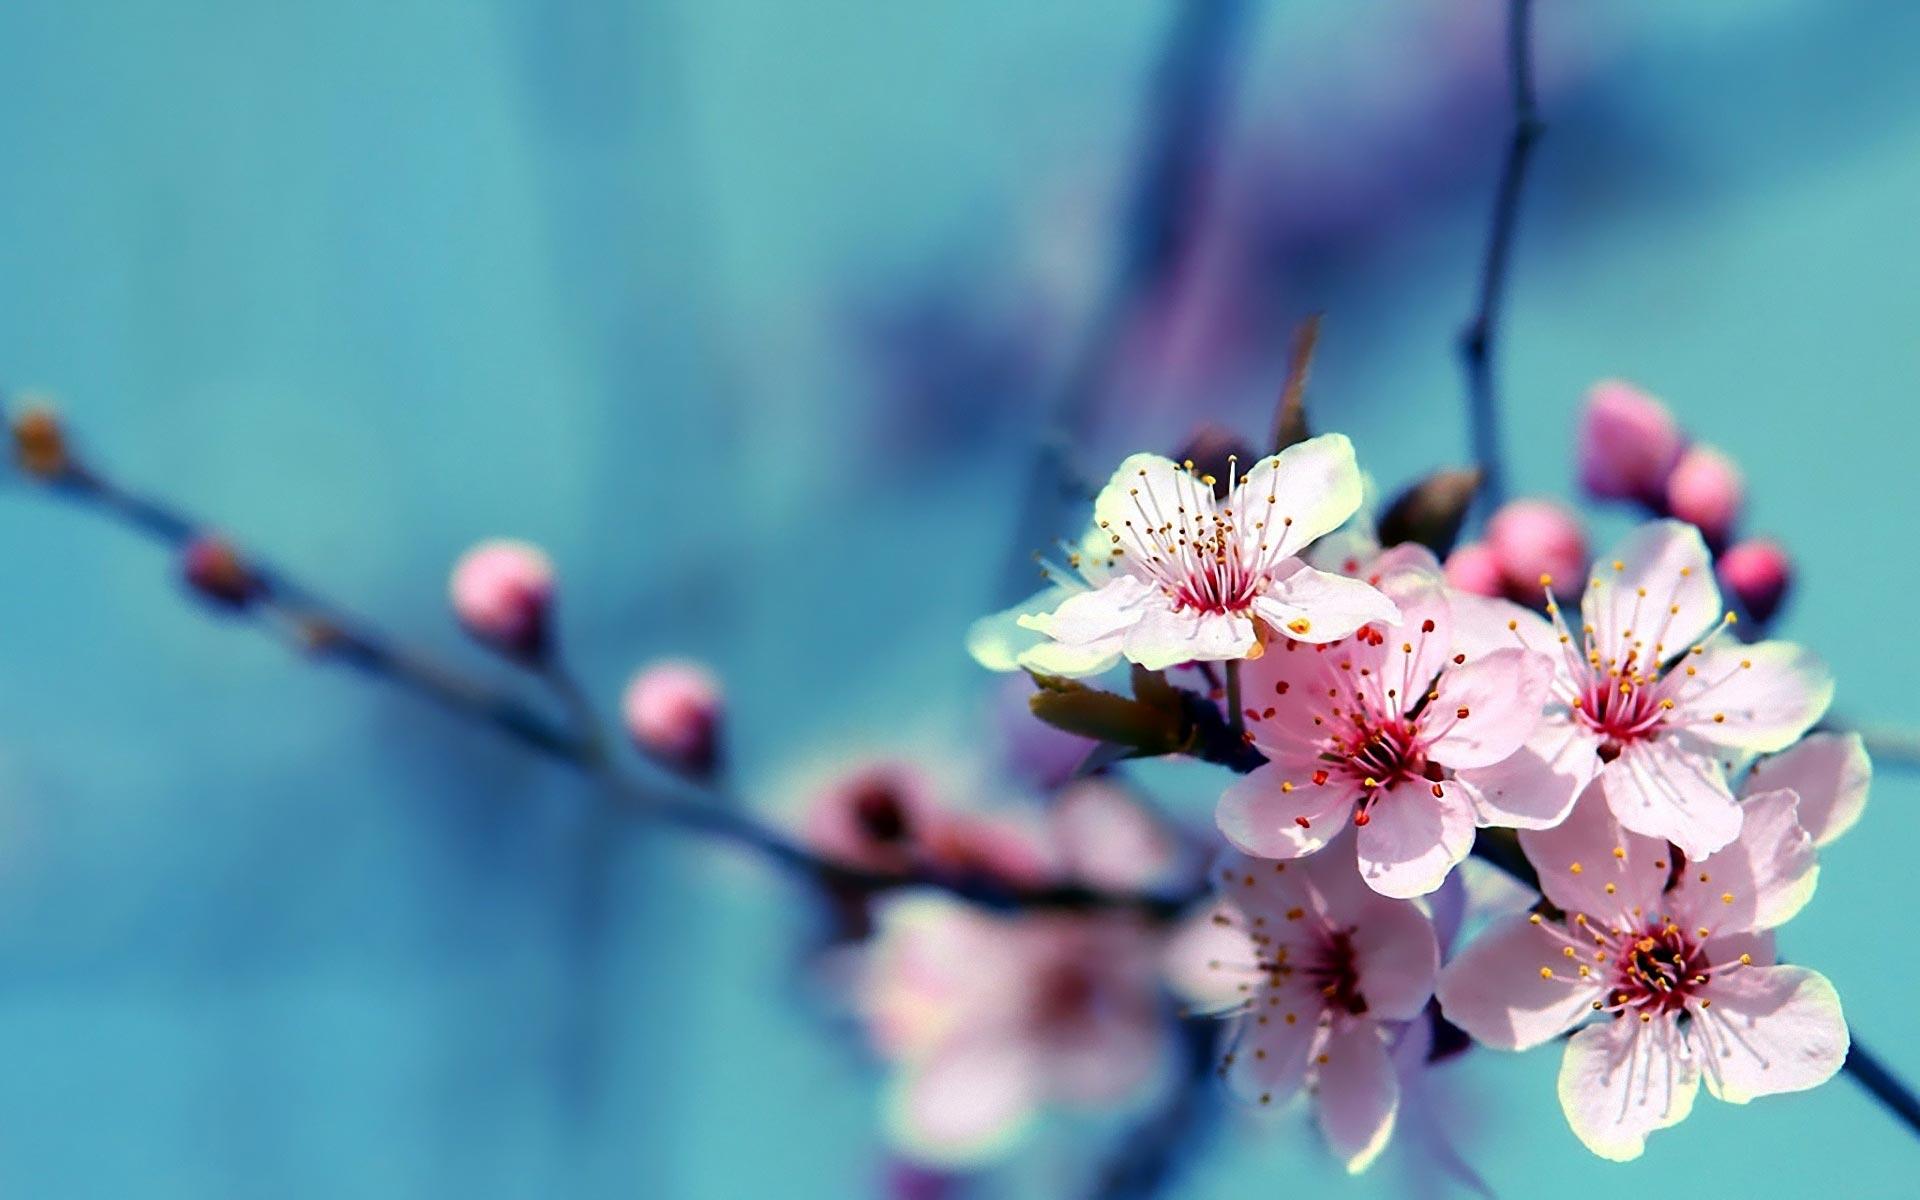 Download Flower Laptop Wallpaper, HD Backgrounds Download